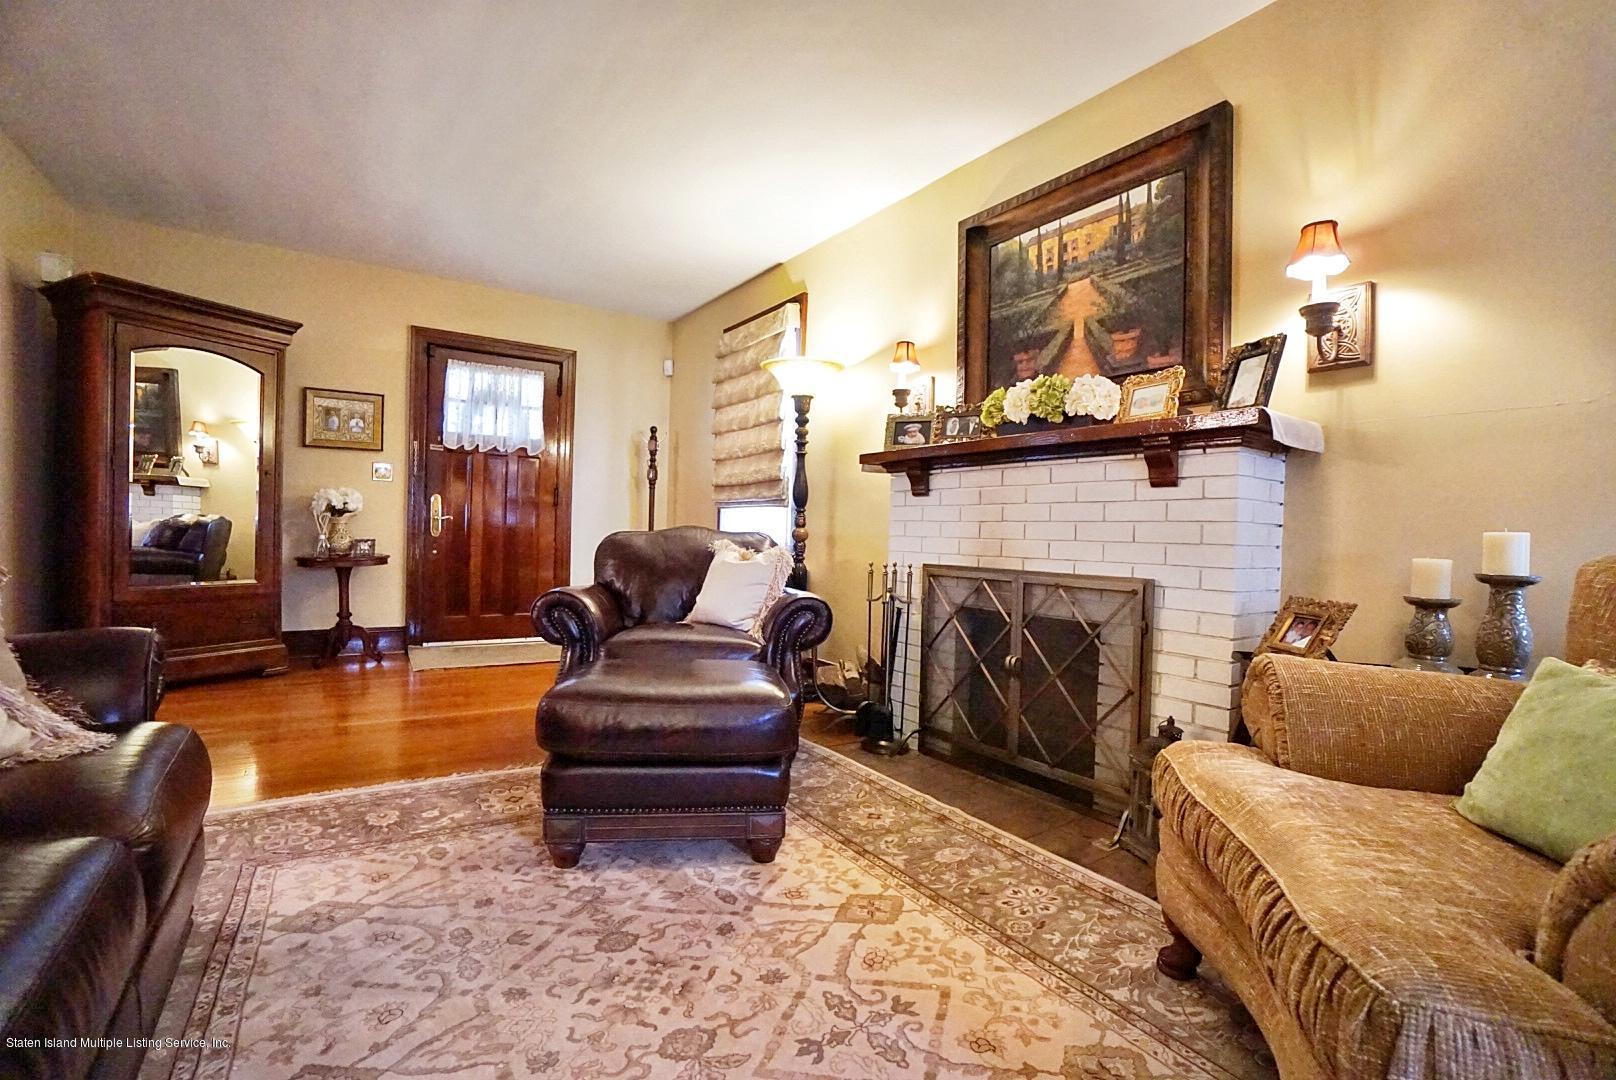 Single Family - Detached 171 Keiber Court  Staten Island, NY 10314, MLS-1127425-11